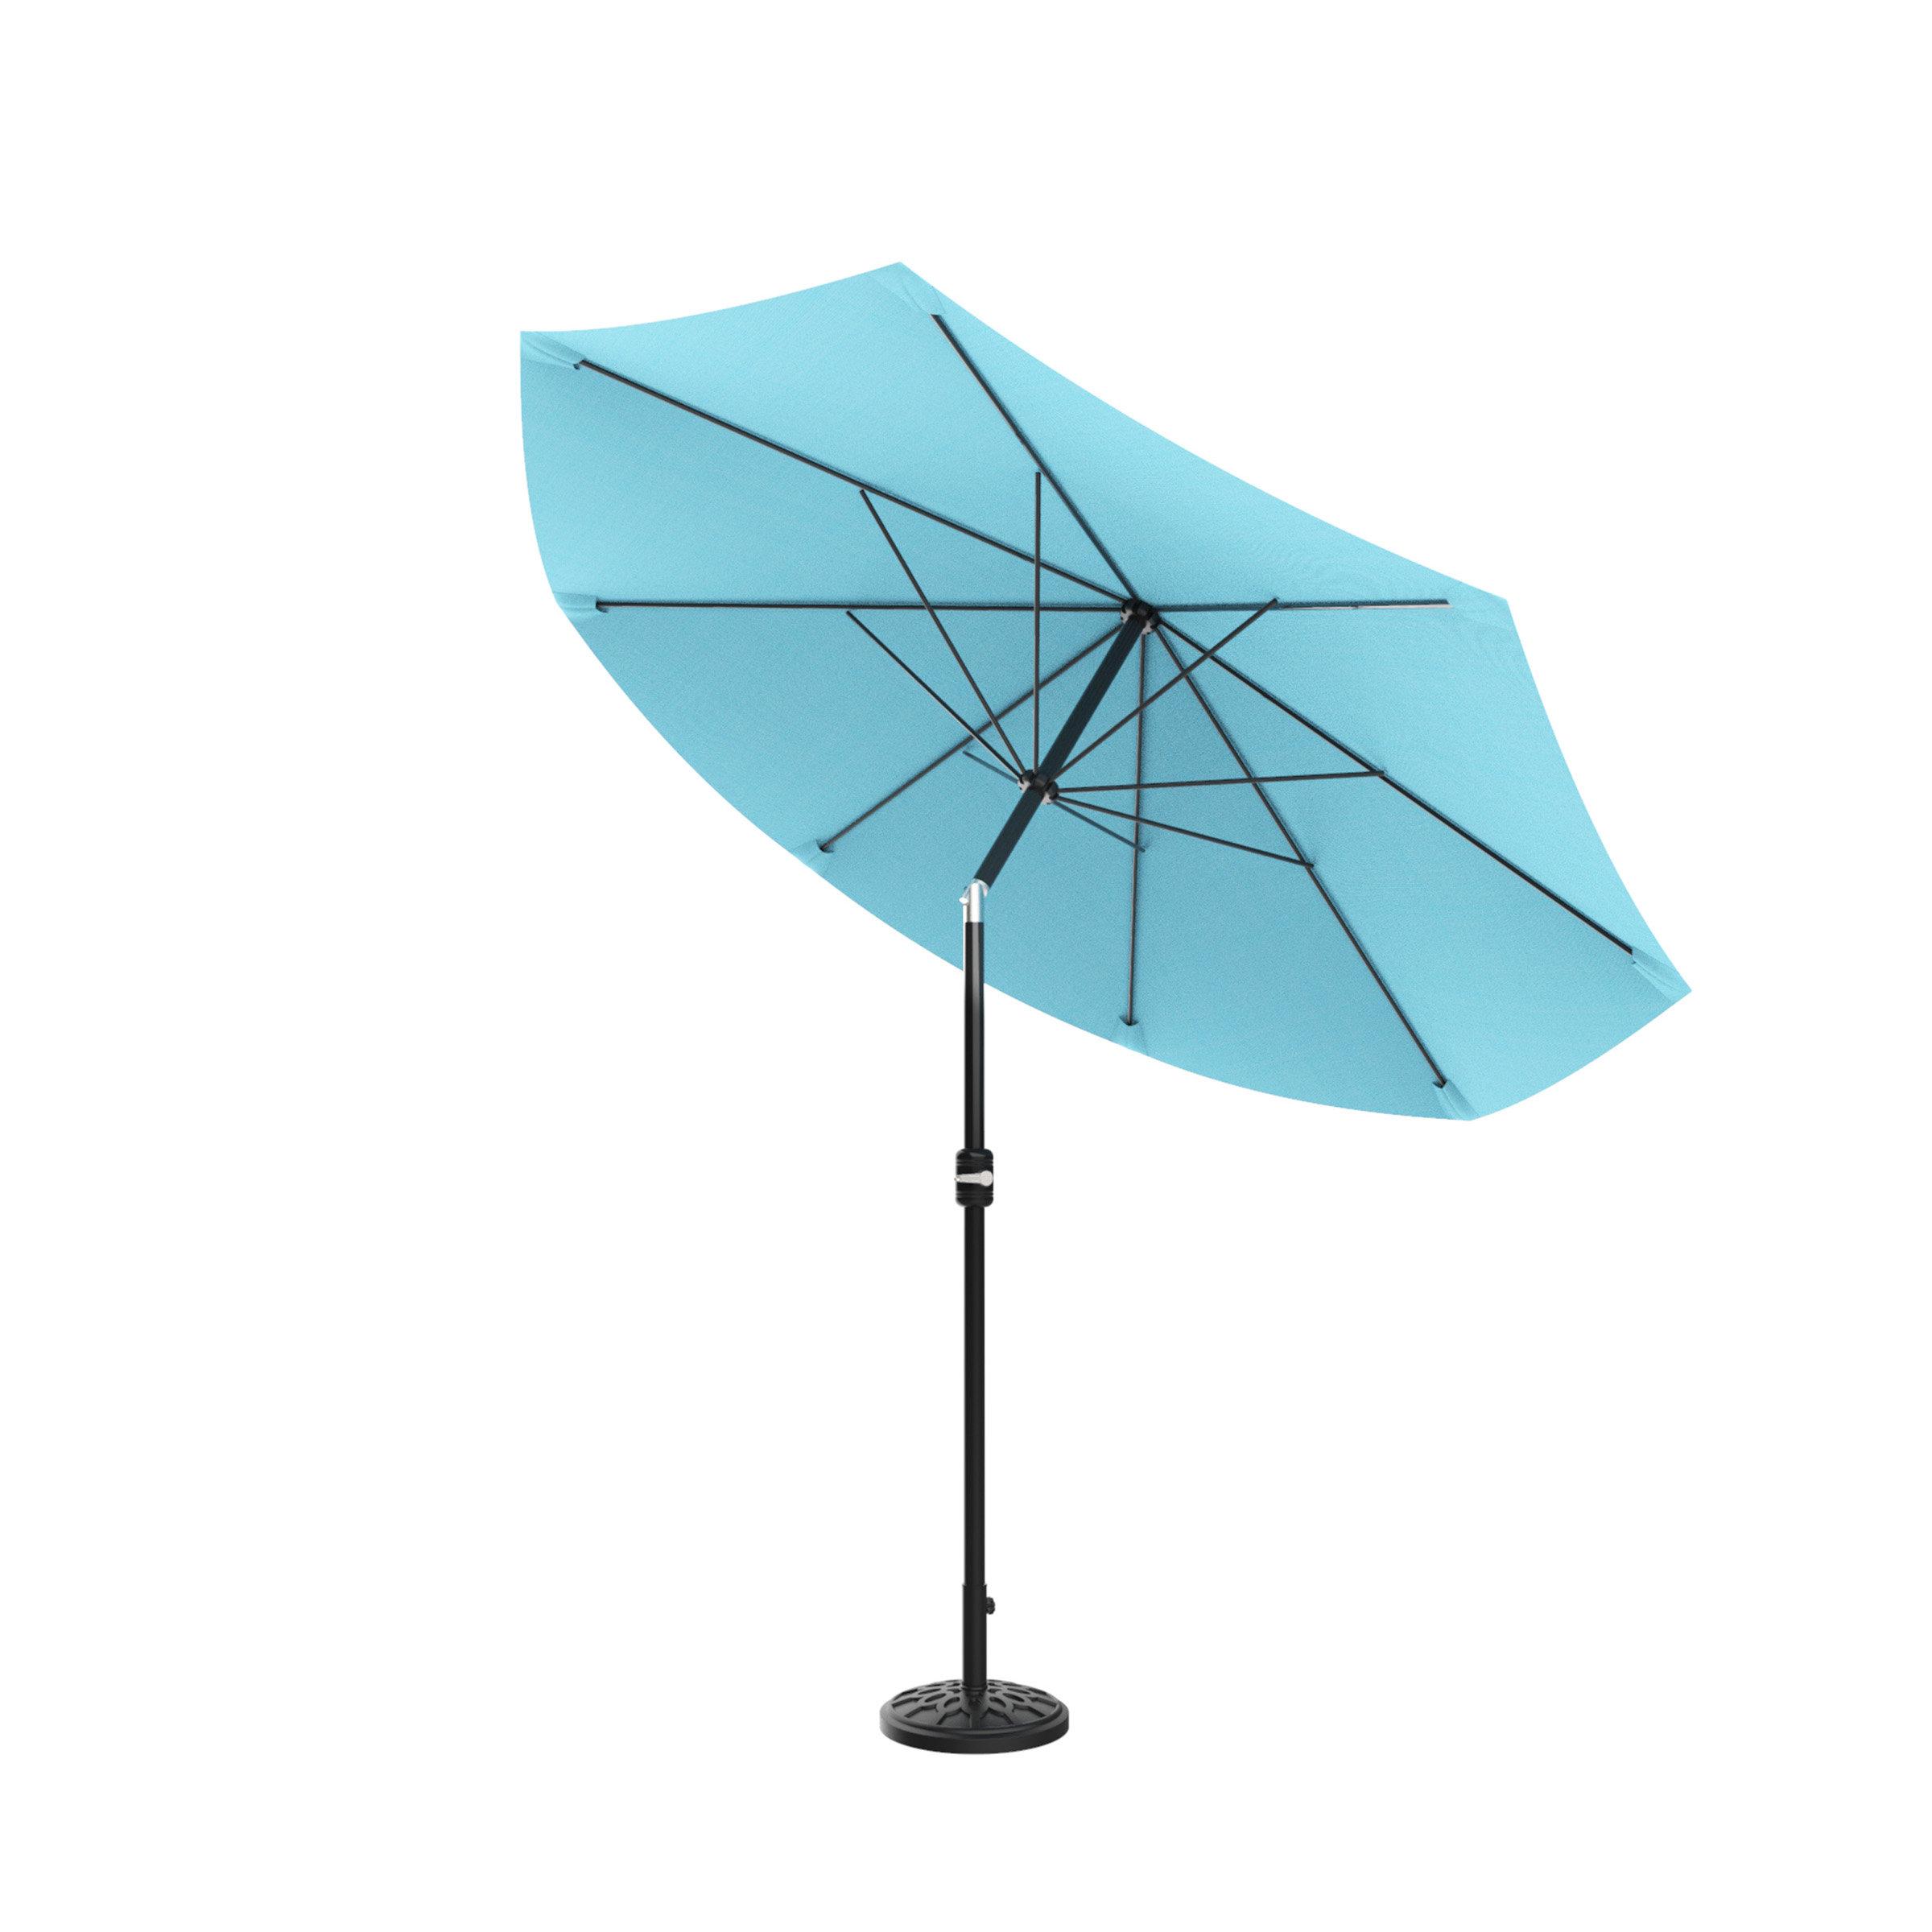 Most Recently Released Kelton 10' Market Umbrella Pertaining To Kelton Market Umbrellas (View 2 of 20)